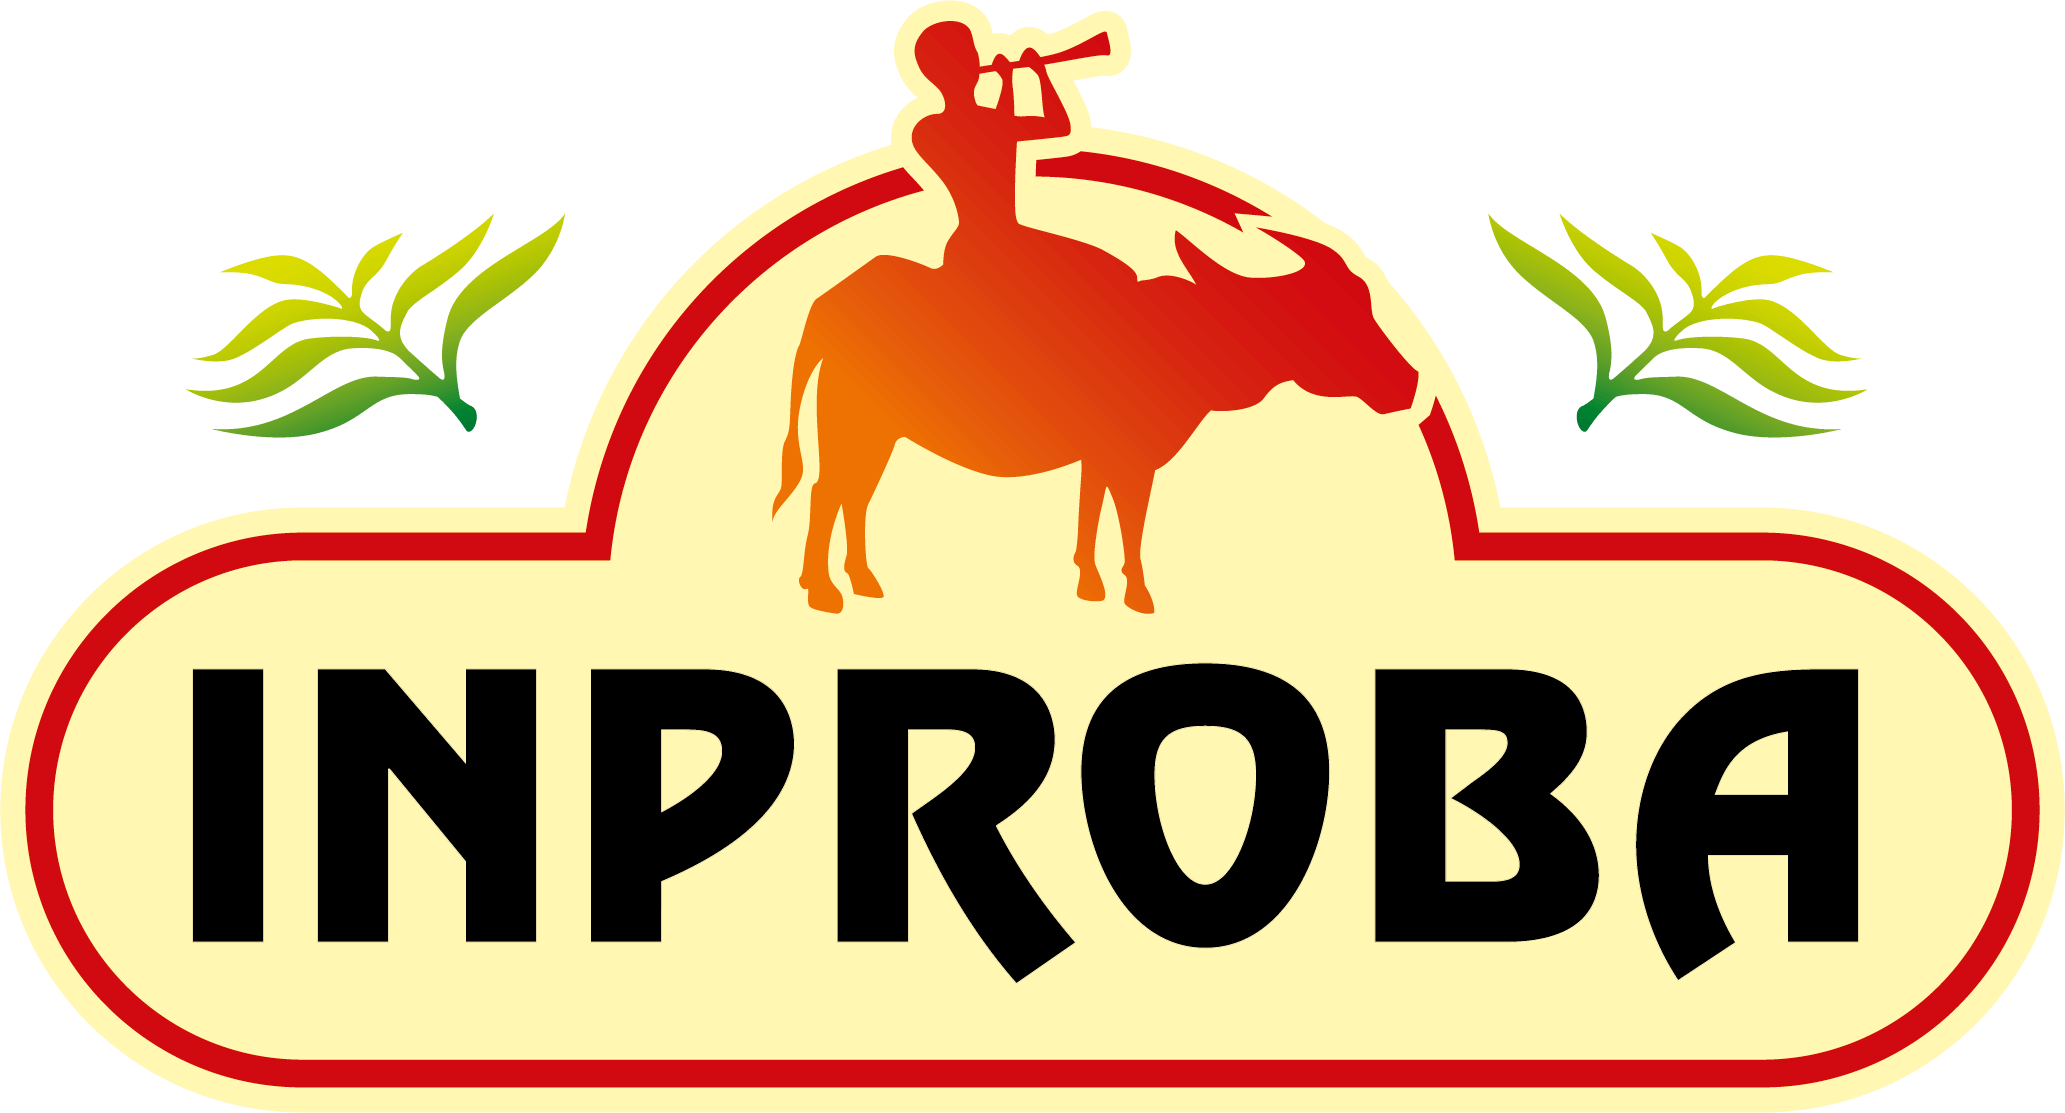 Inproba logo